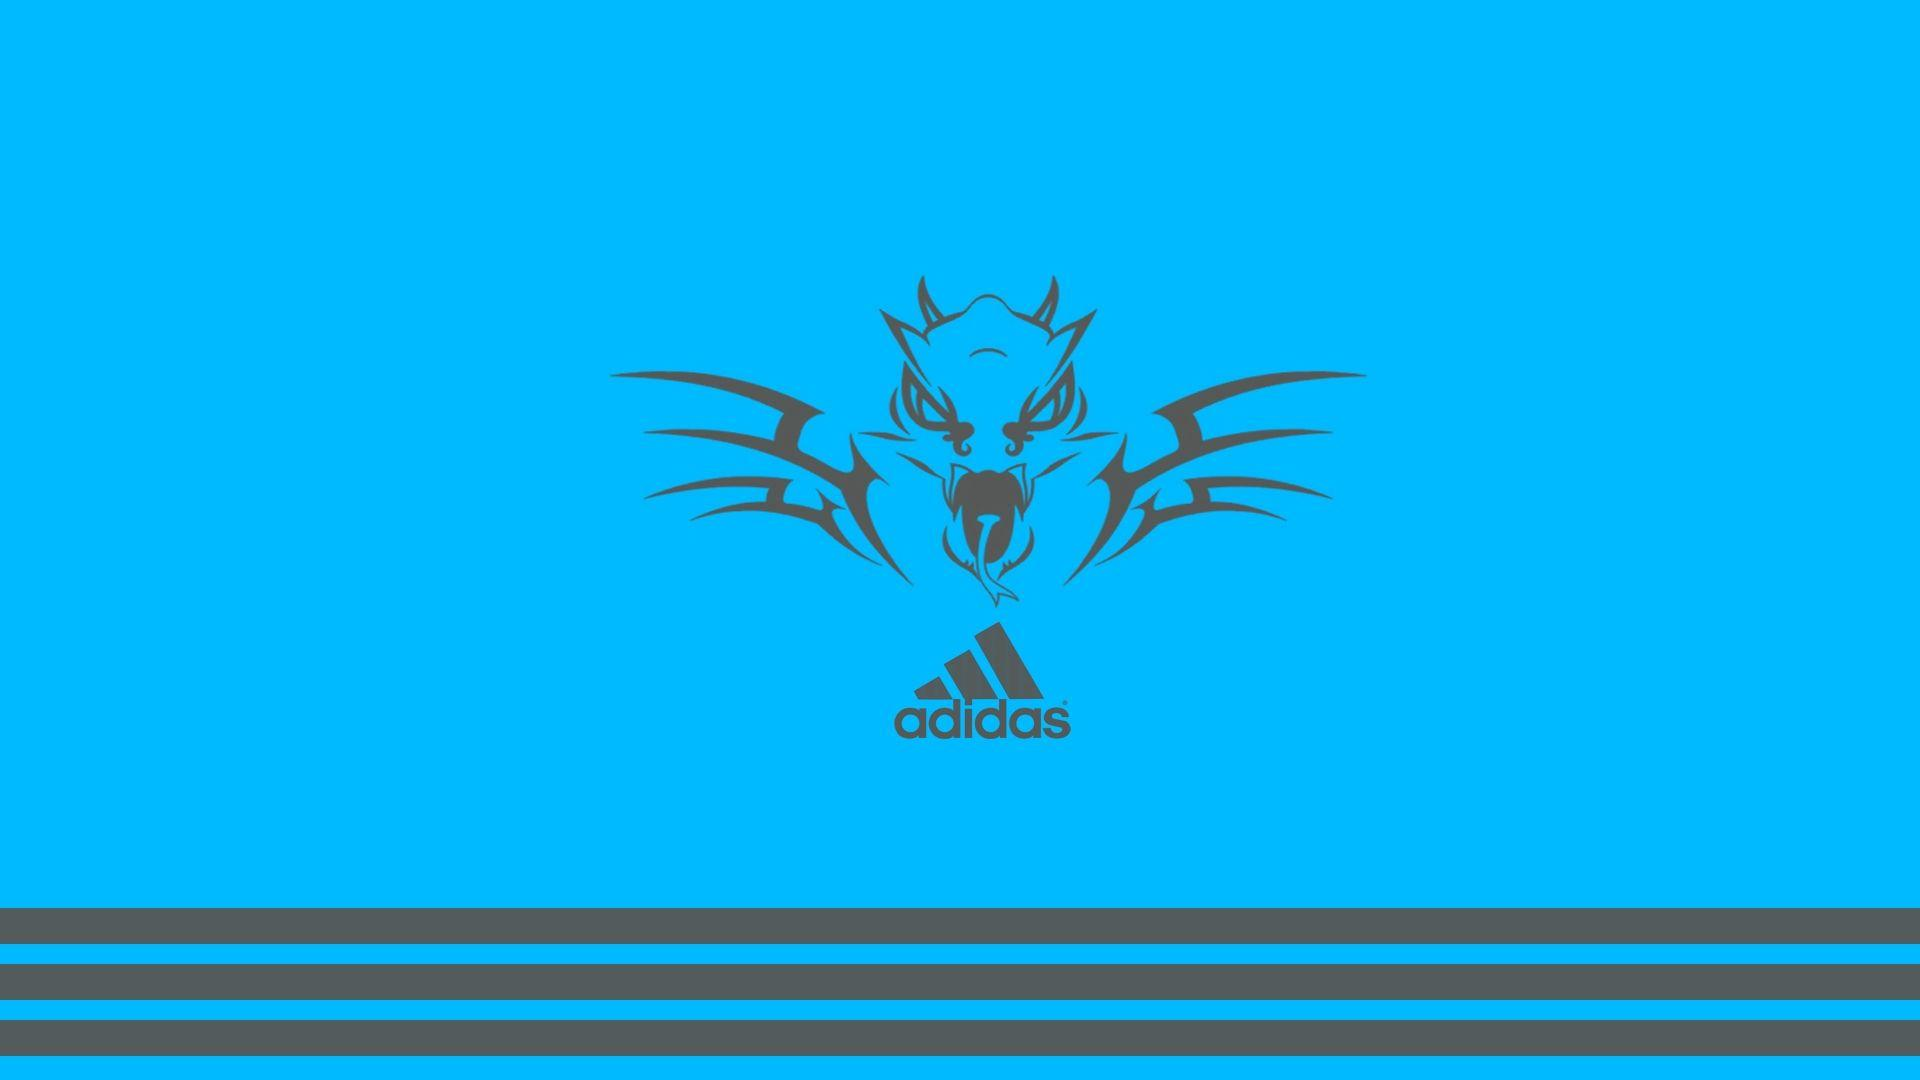 Free Adidas Logo Wallpapers Wallpaper Cave